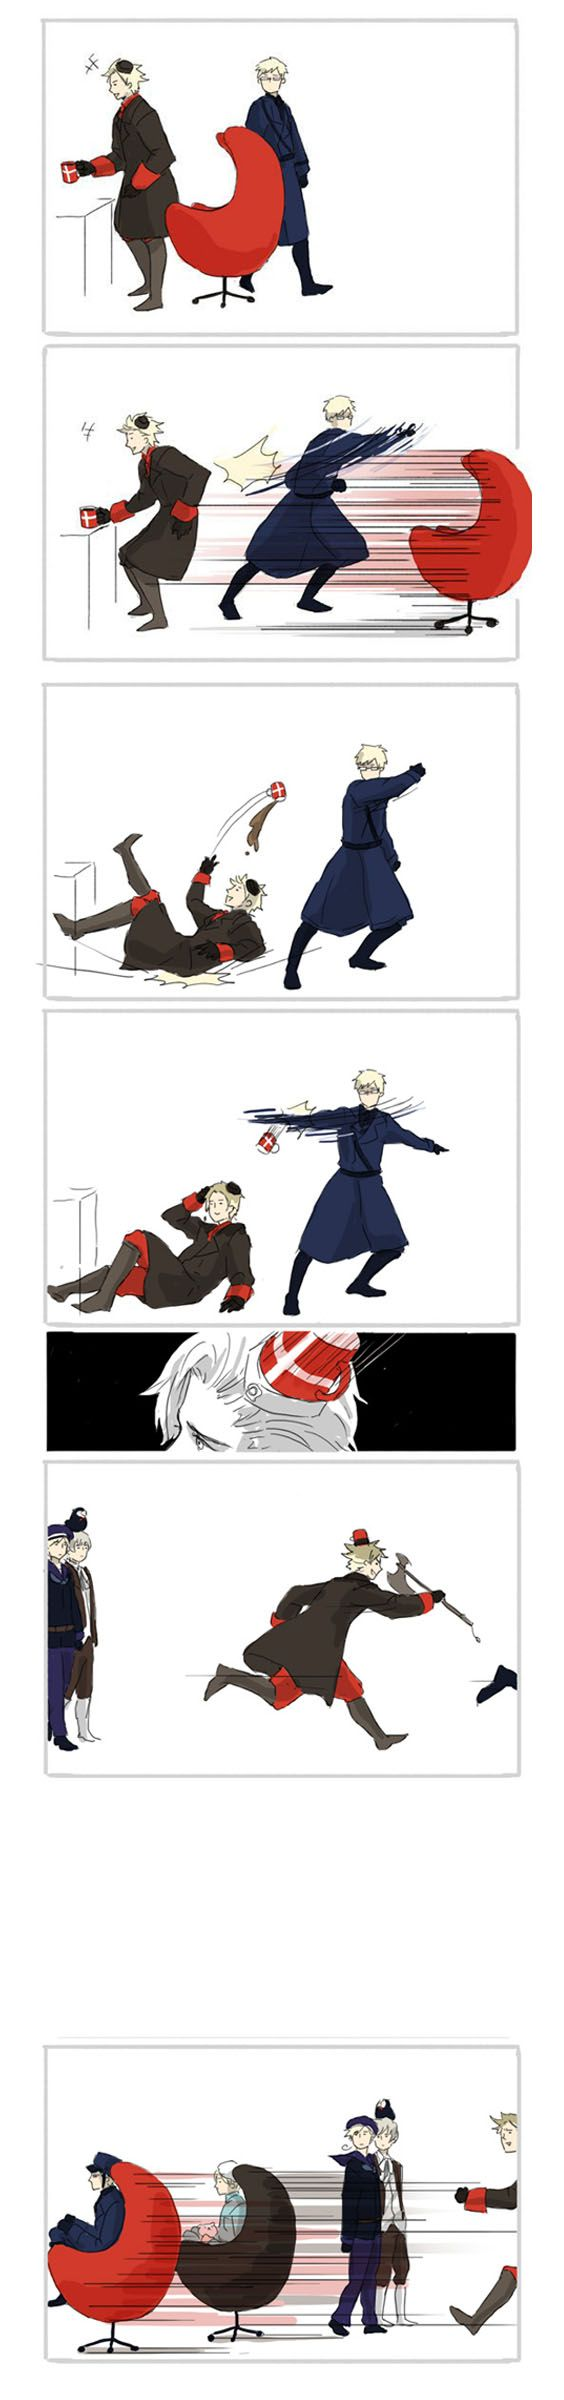 zerochan/Axis Powers: Hetalia/Nordic Countries/#942197